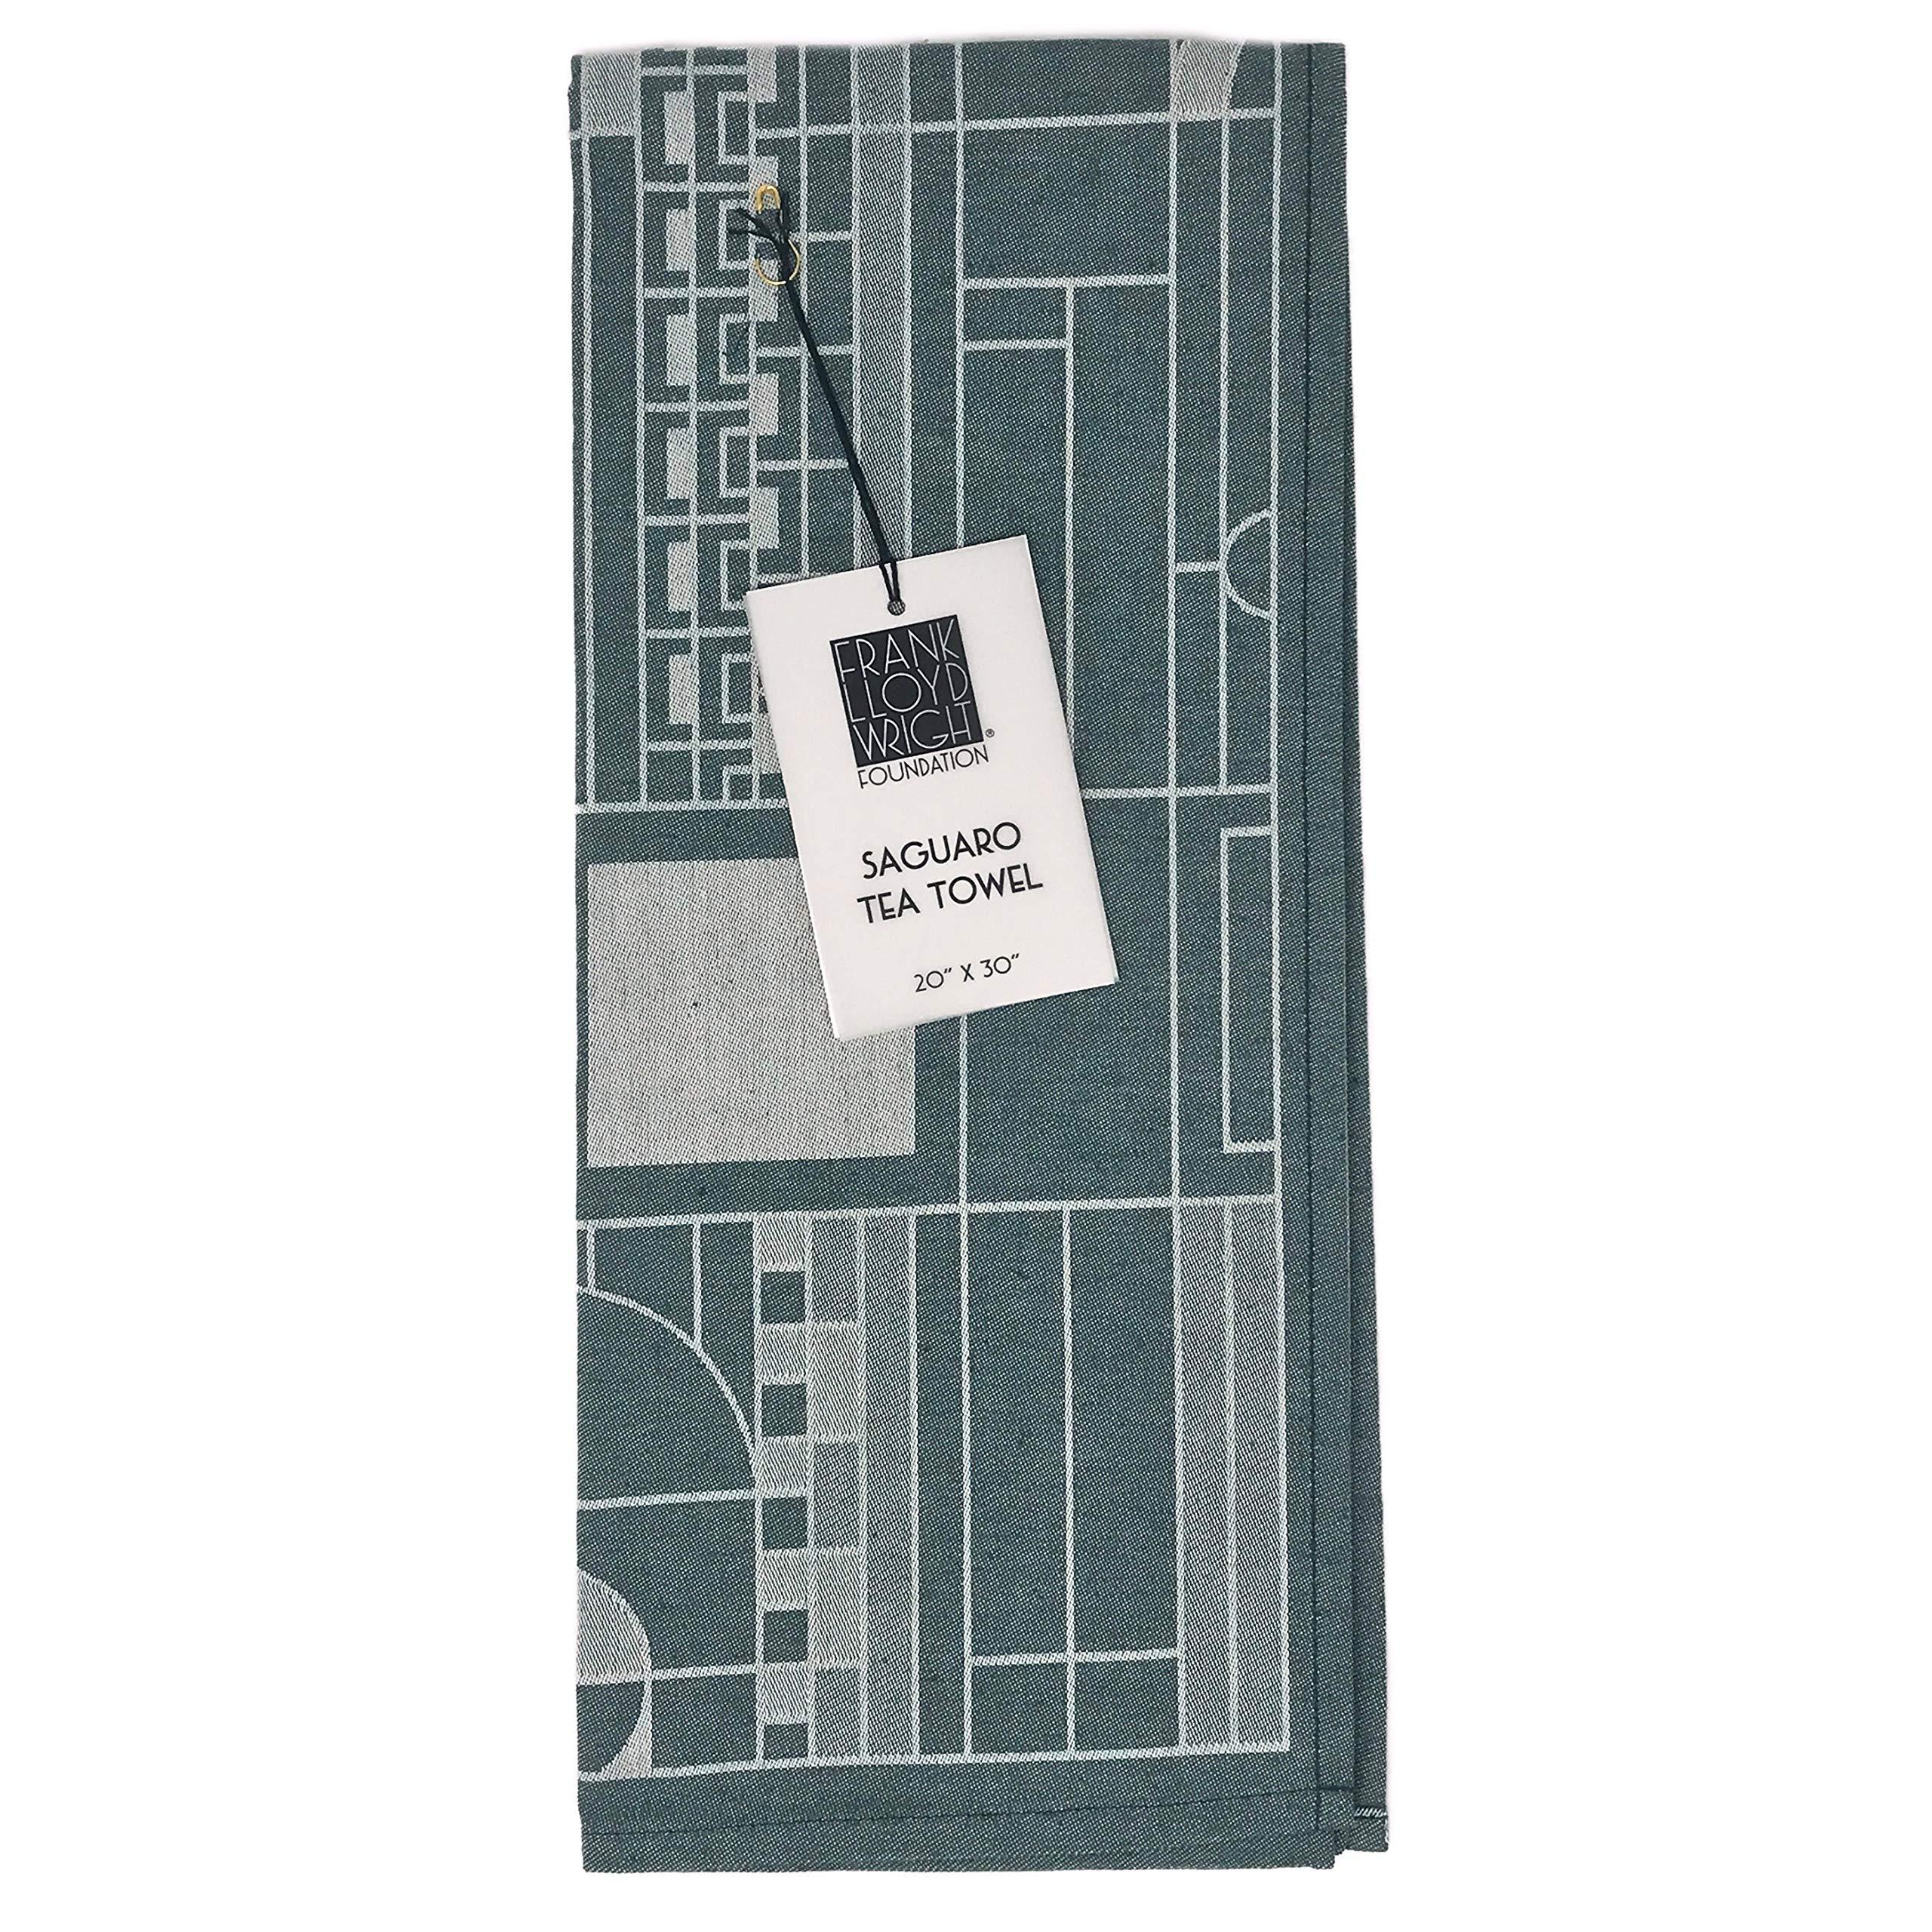 KAF Home Frank Lloyd Wright Woven Jacquard Tea Towel 20 x 30-inch 100-Percent Cotton (Saguaro)